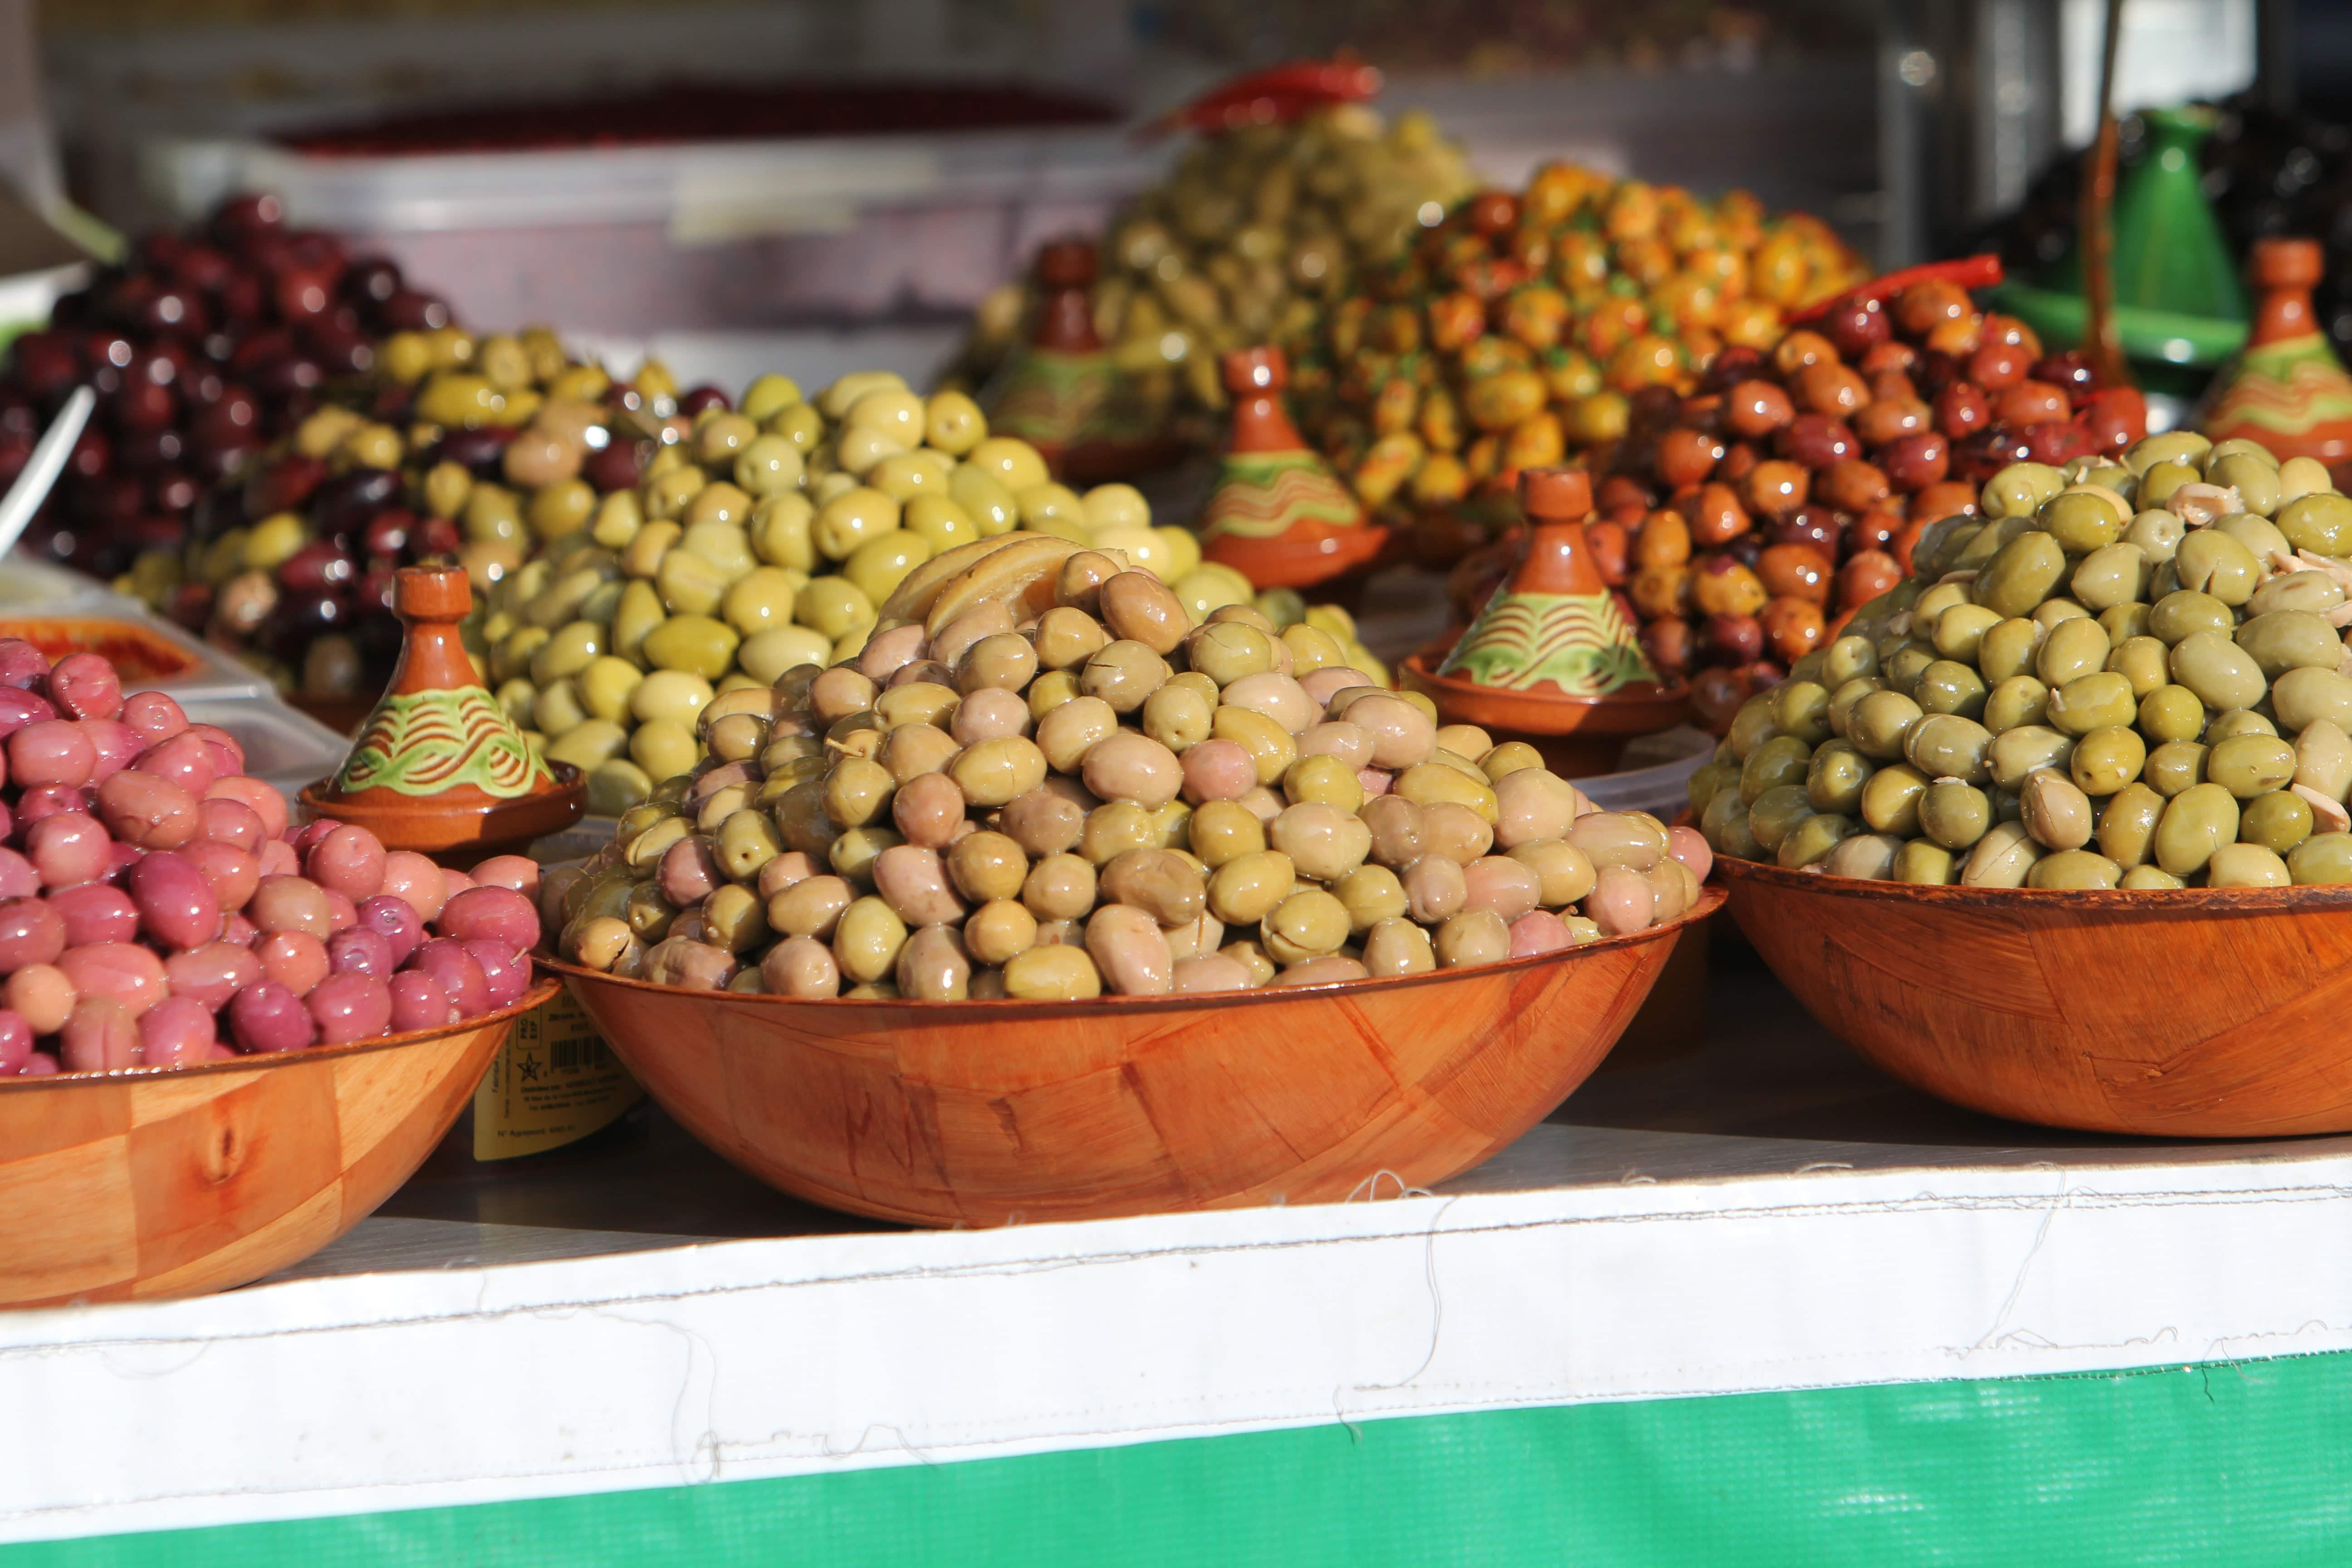 How to Make Olives Live Longer